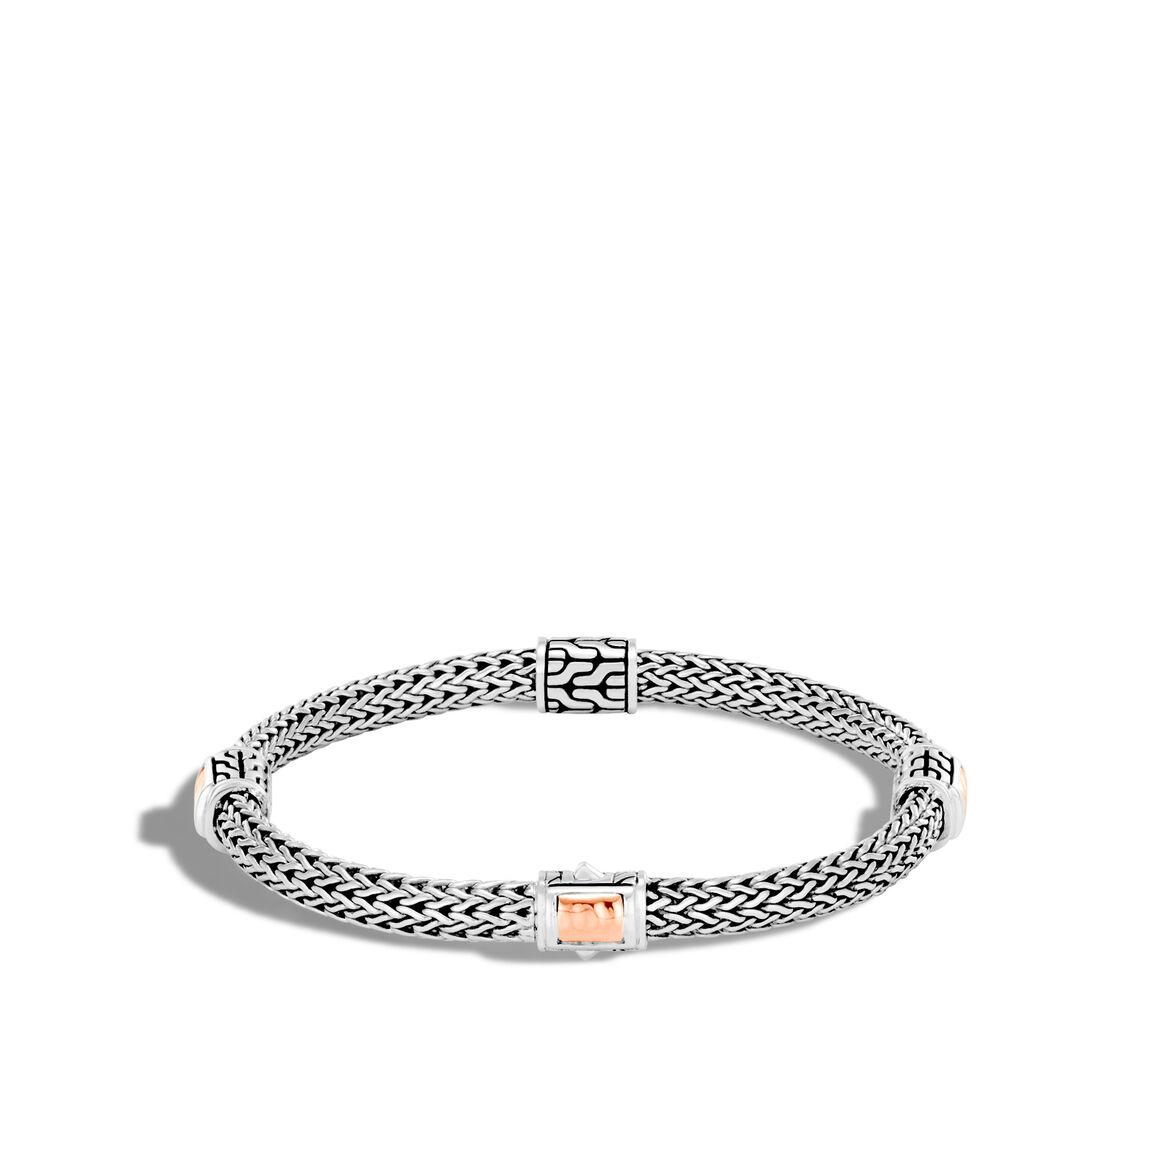 Classic Chain 5MM Hammered Station Bracelet, Silver, 18K Rose